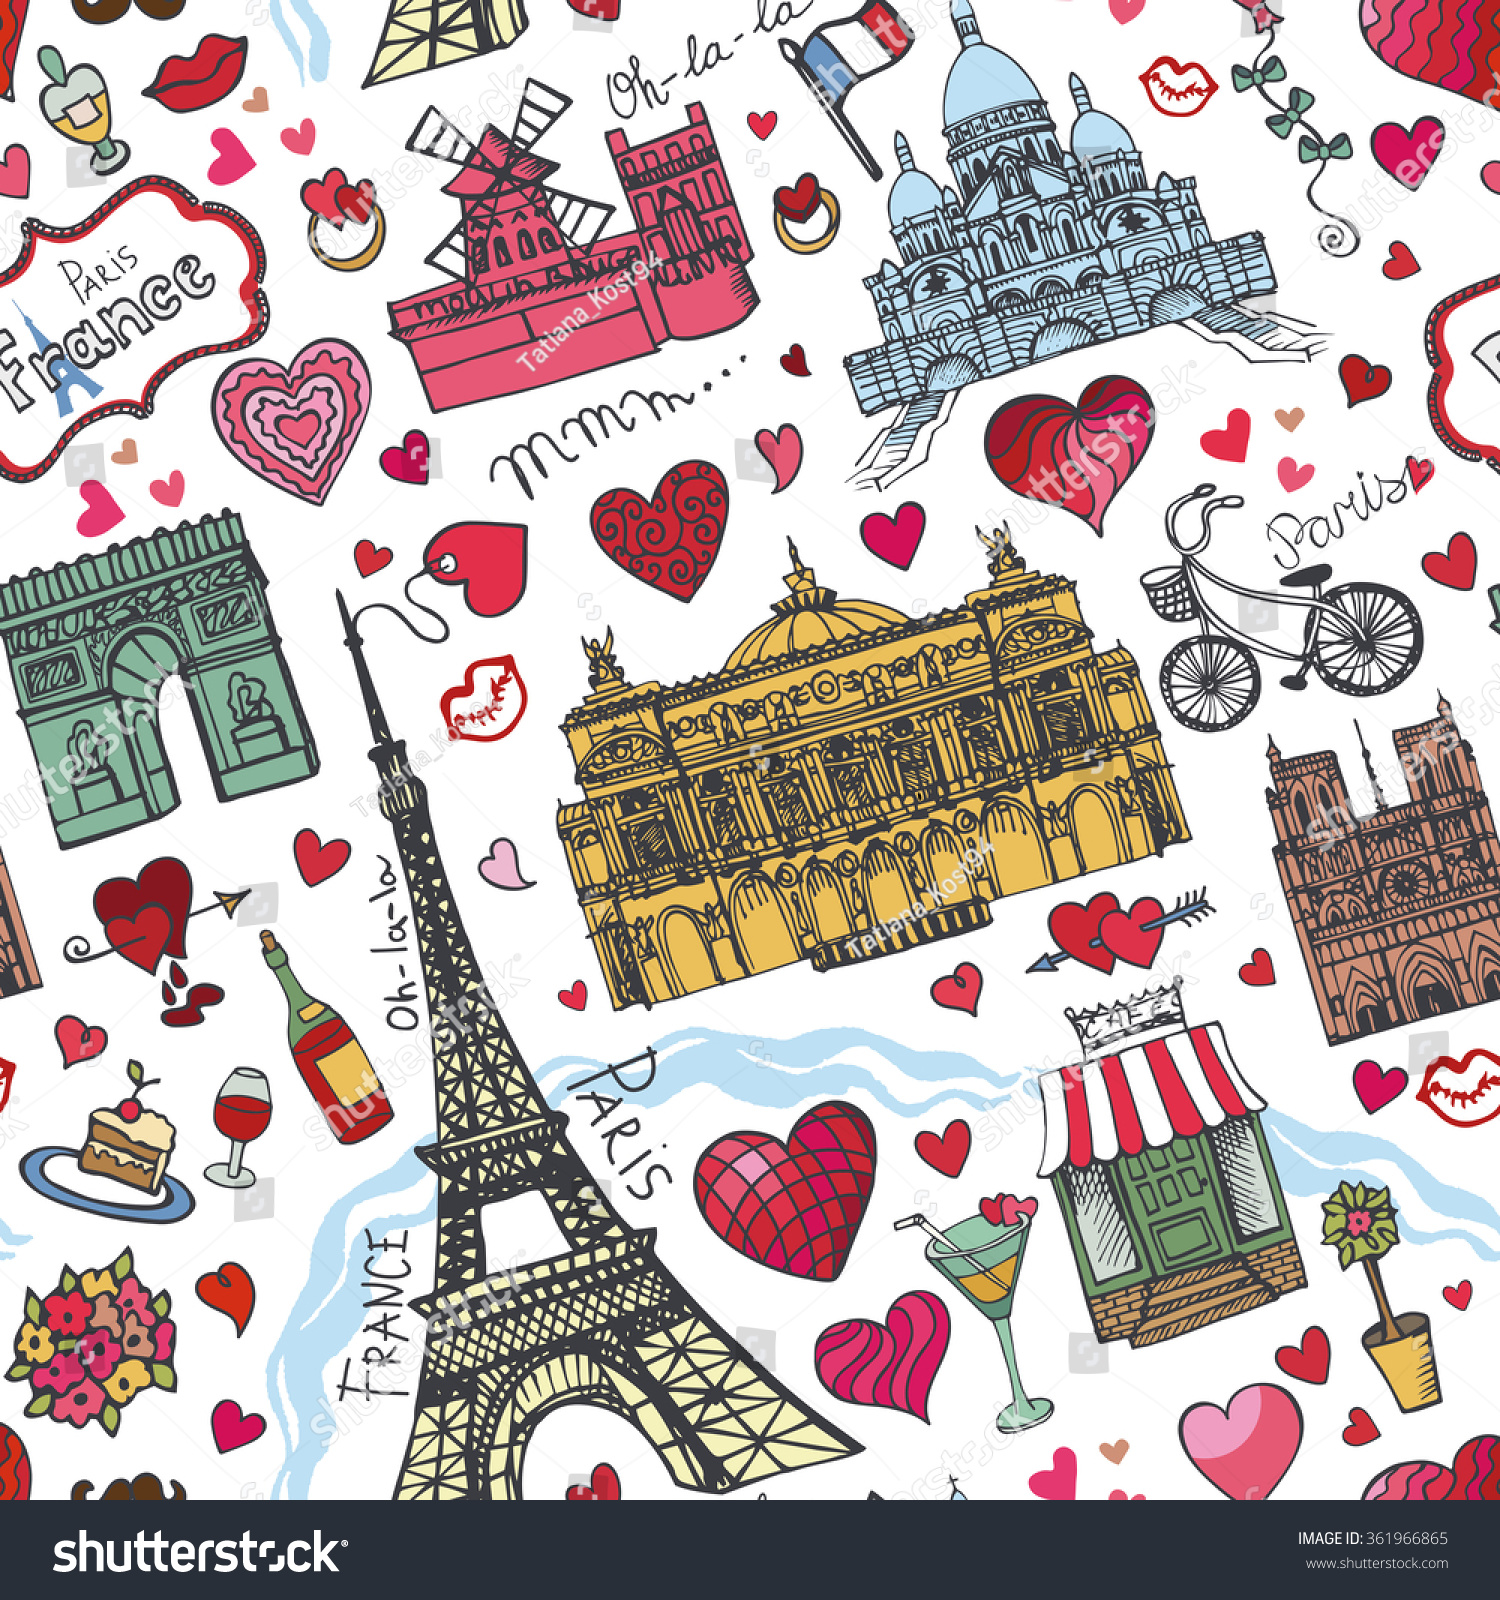 Old paris street map royalty free stock photo image 15885665 - Jpg 1500x1600 Paris Map Background